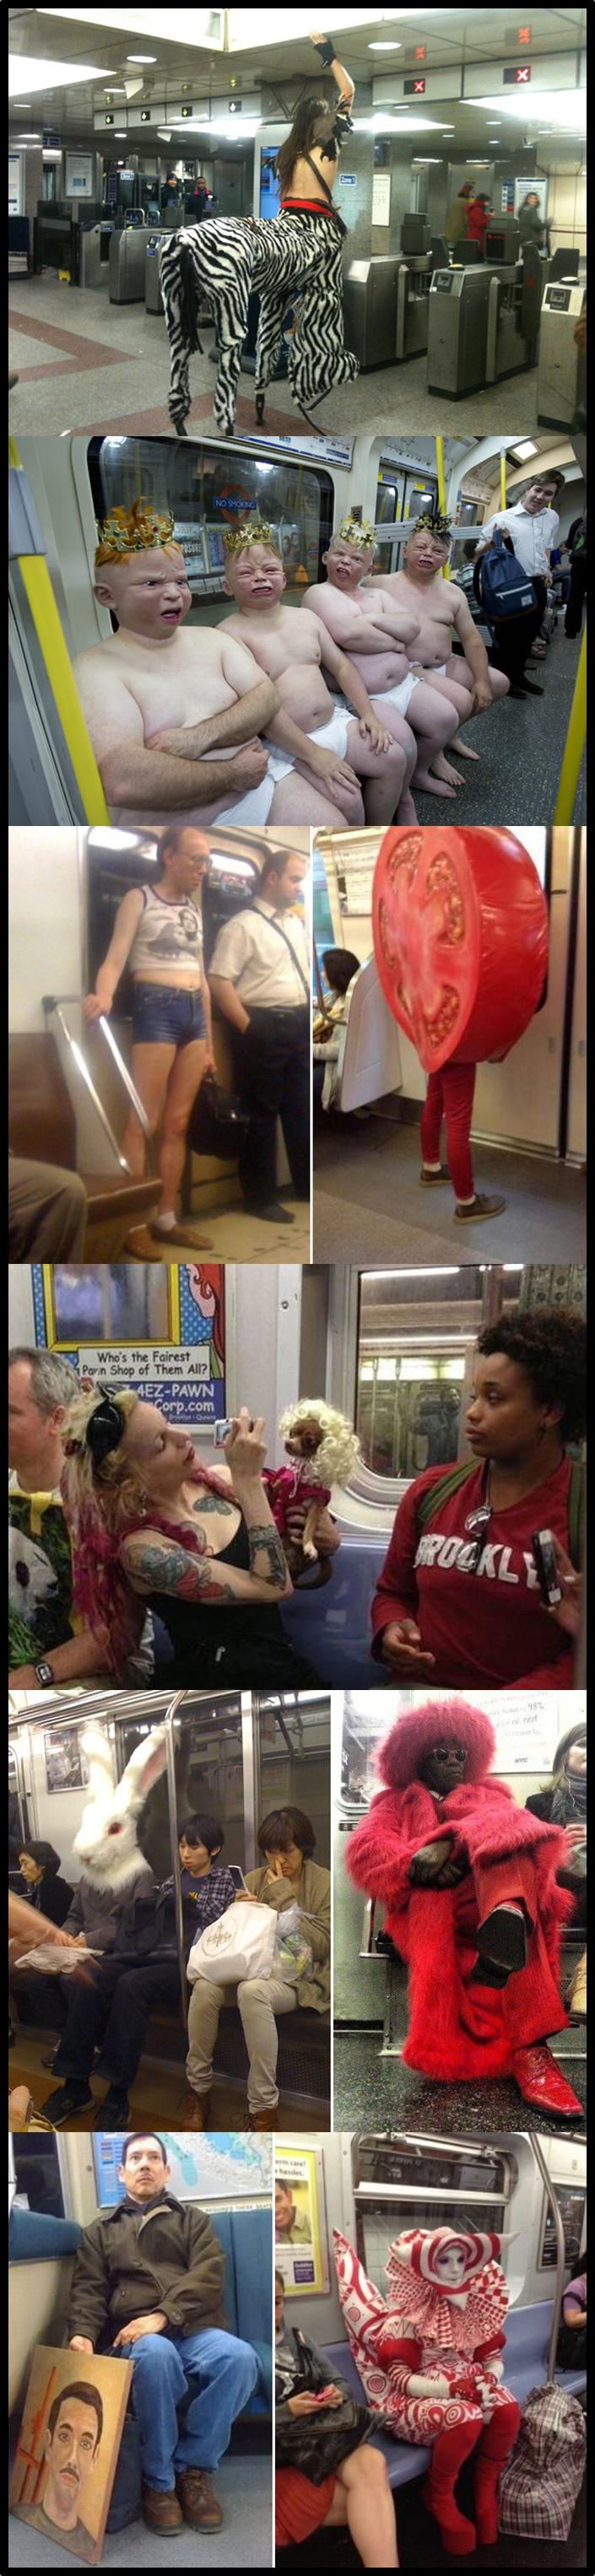 Best place to make friends. I don't always meet freaks on the underground……. Underground metro subway